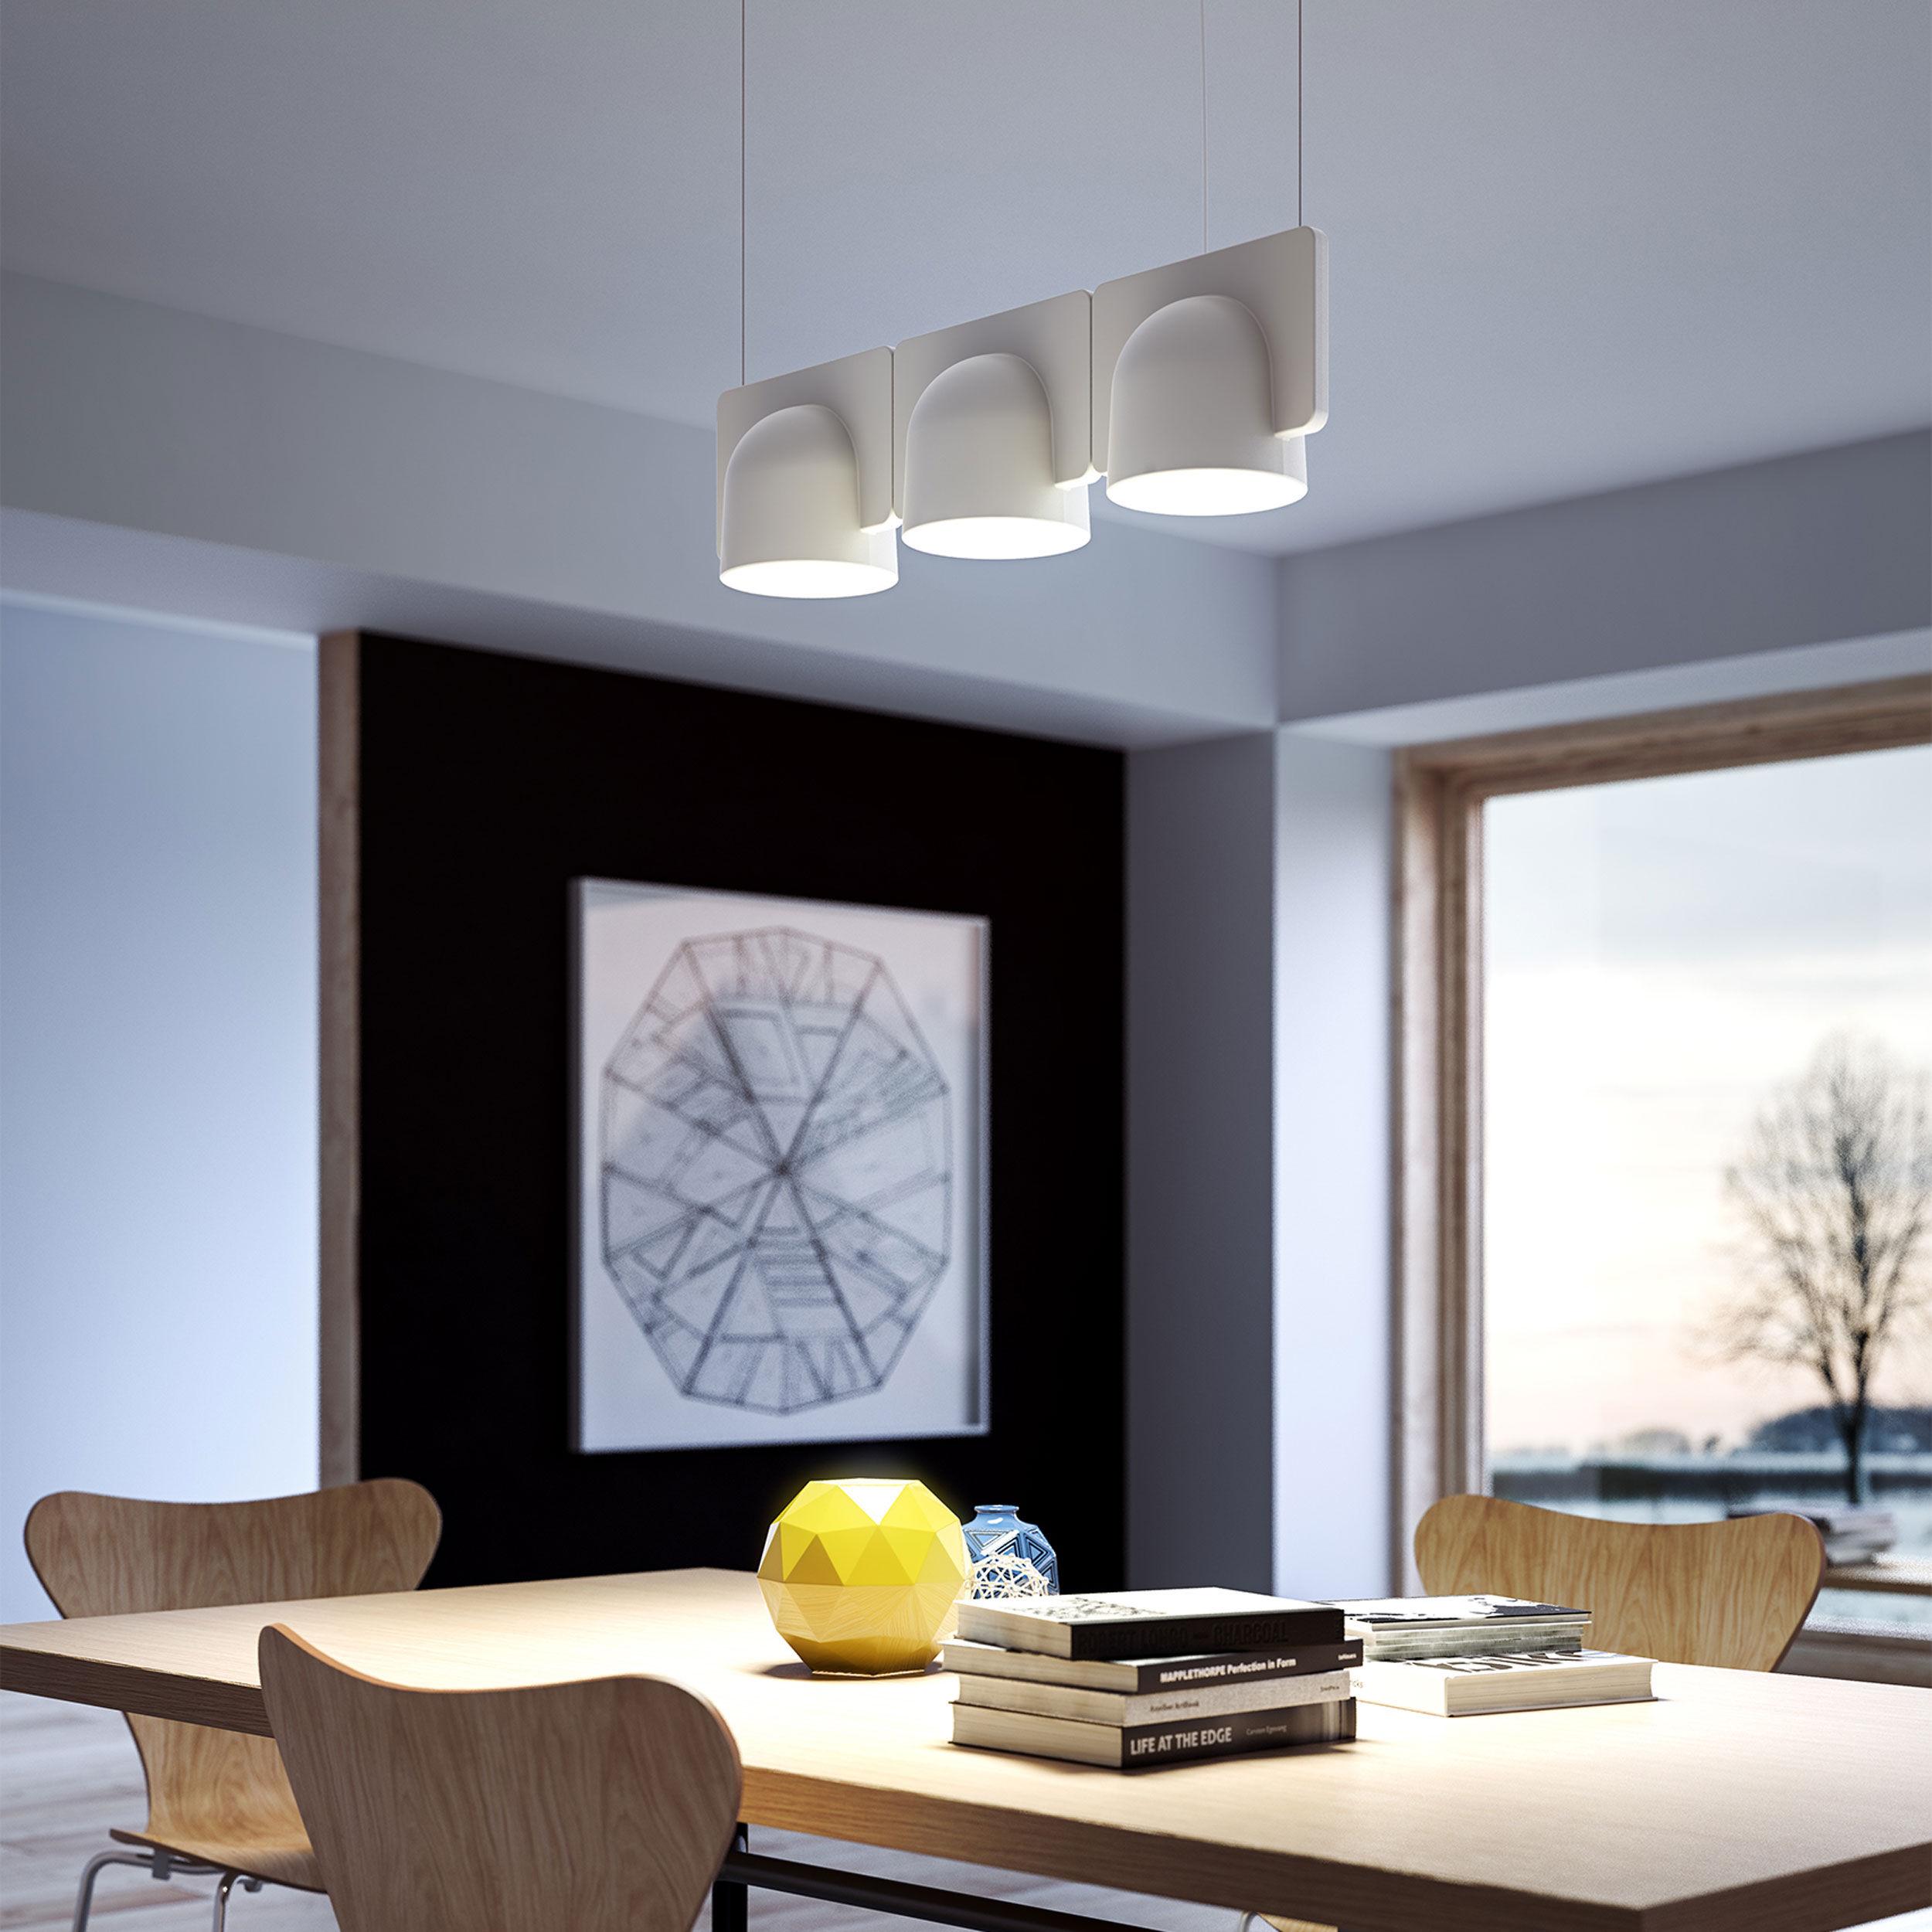 suspension igloo 3 led l 66 cm eclairage direct indirect blanc gris fontana arte. Black Bedroom Furniture Sets. Home Design Ideas